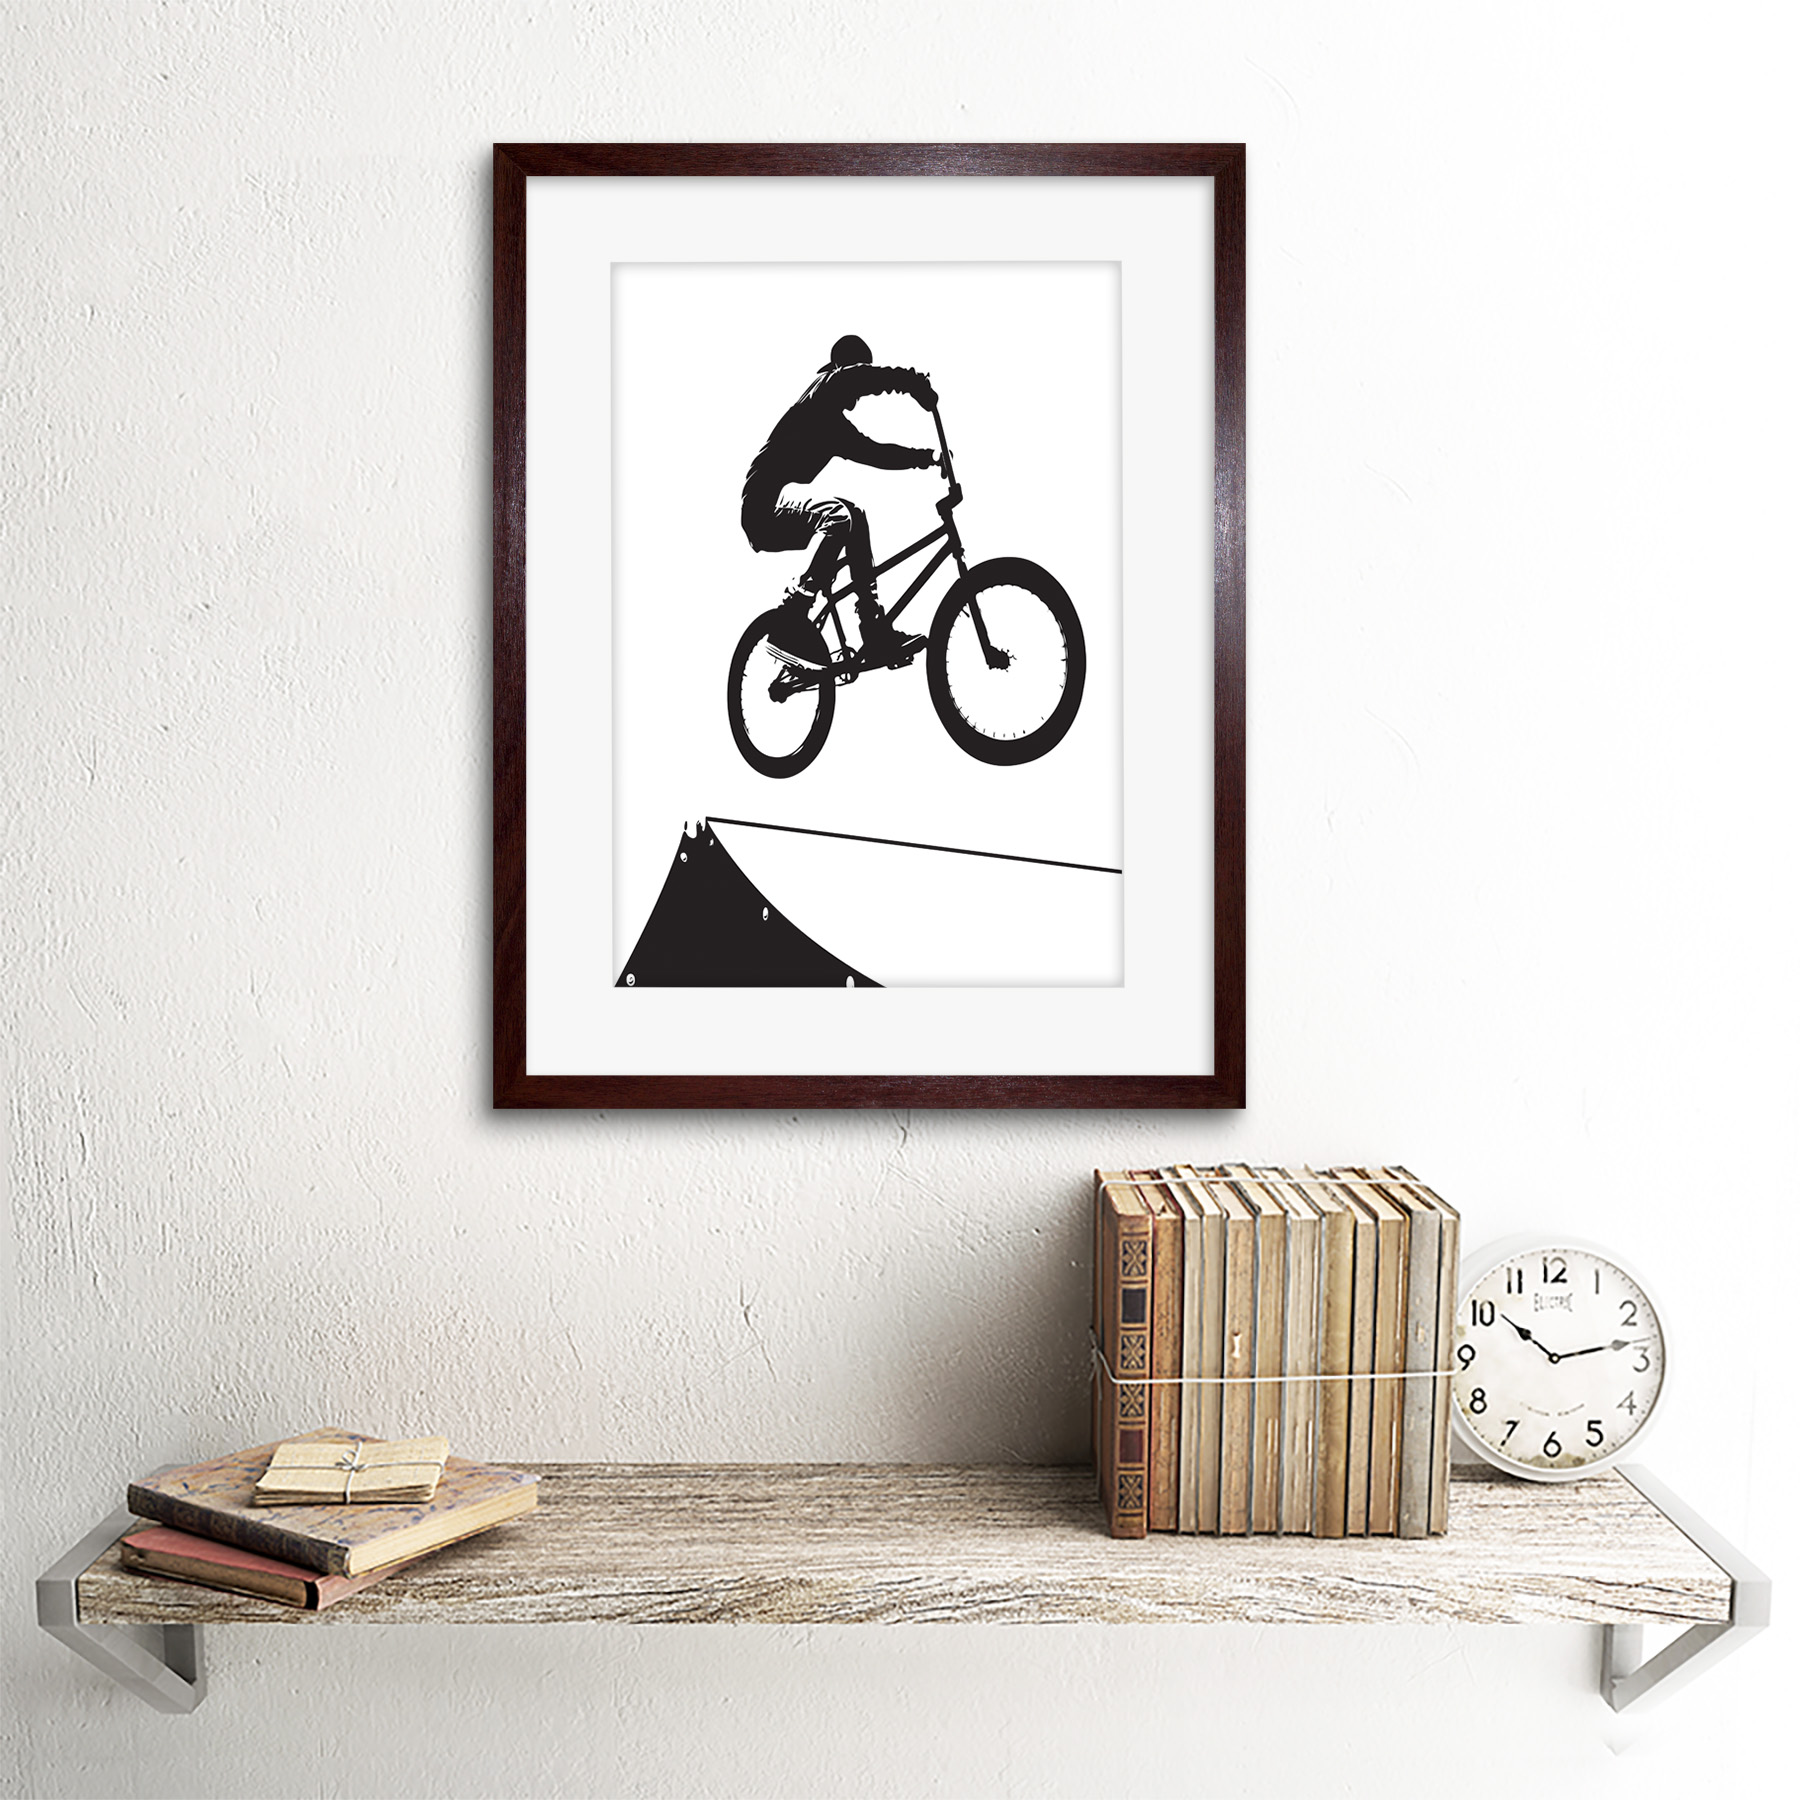 "Indexbild 8 - Painting Sport Bmx Bike Bicycle Jump Air Ramp Black White Framed Print 12x16"""